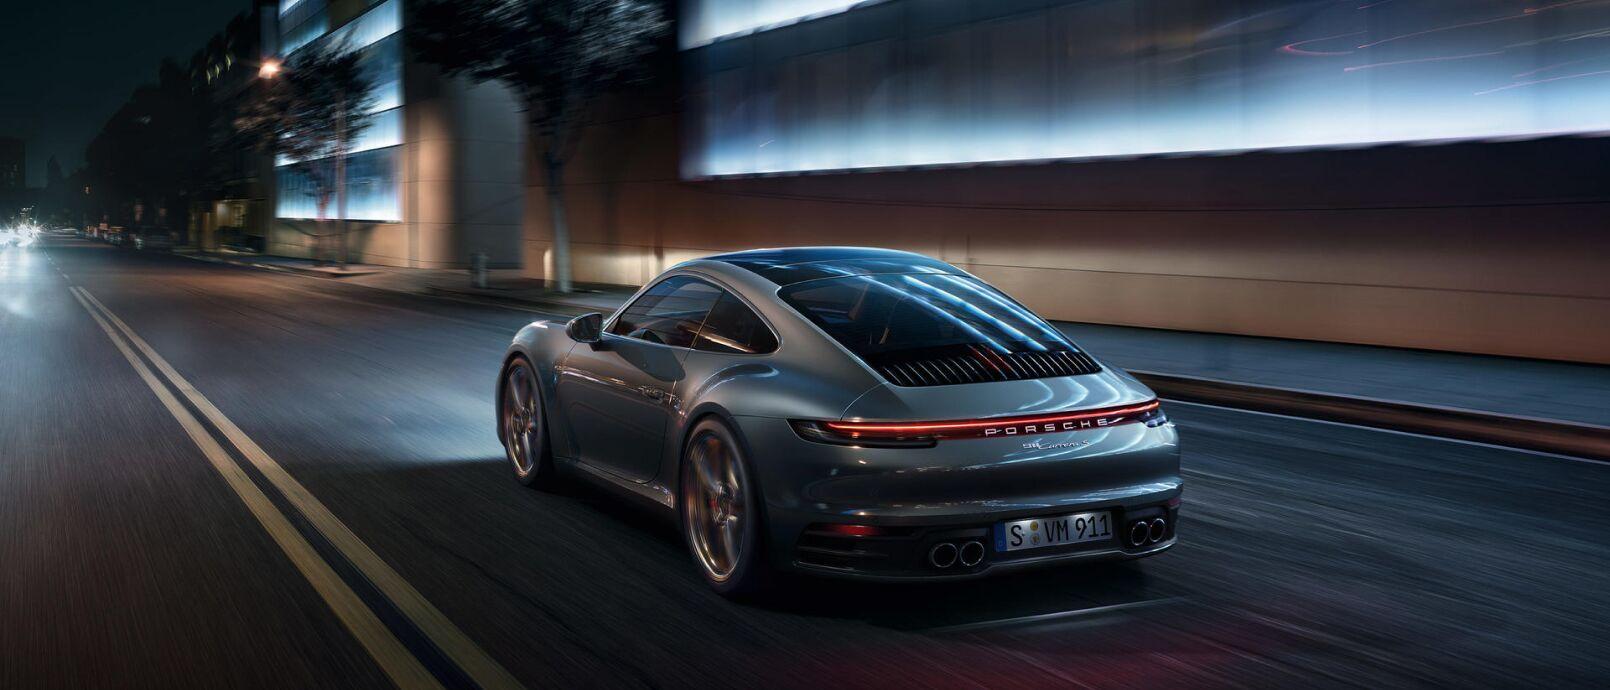 Loeber Motors Porsche is a new and pre-owned Porsche dealership serving Northfield, IL